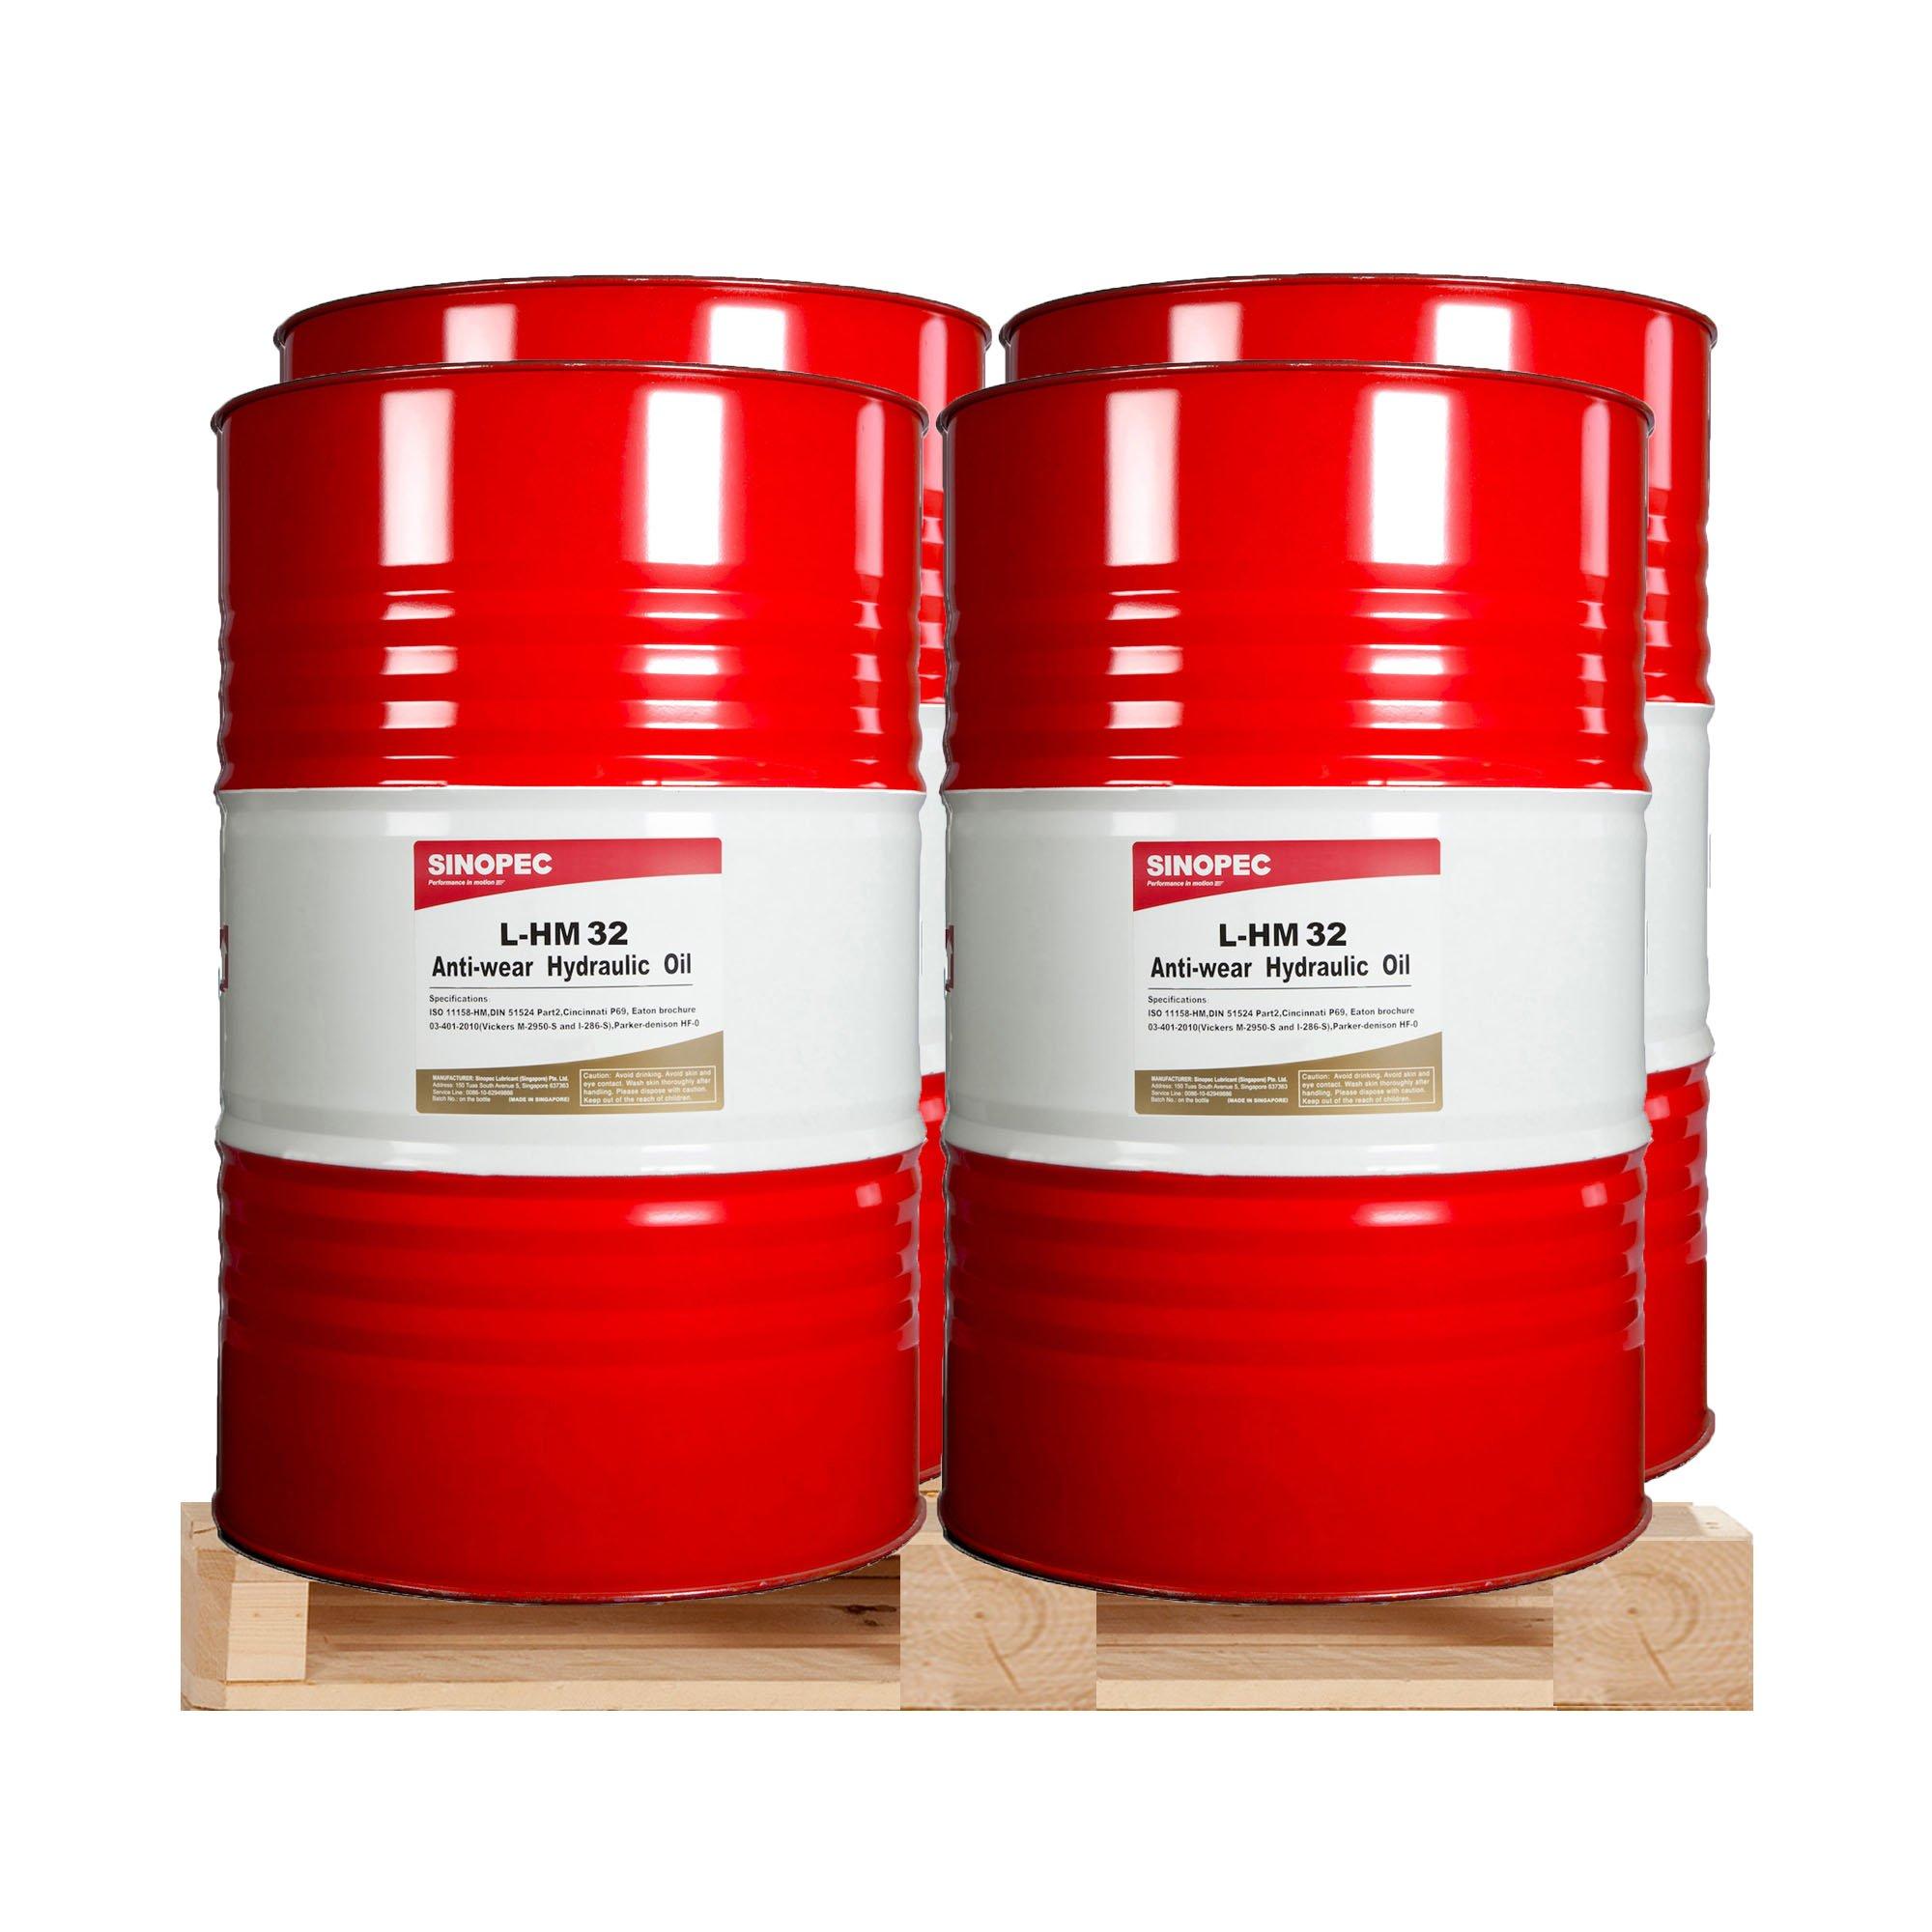 $299 Each - AW 32 Hydraulic Oil - (4) 55 Gallon Drums